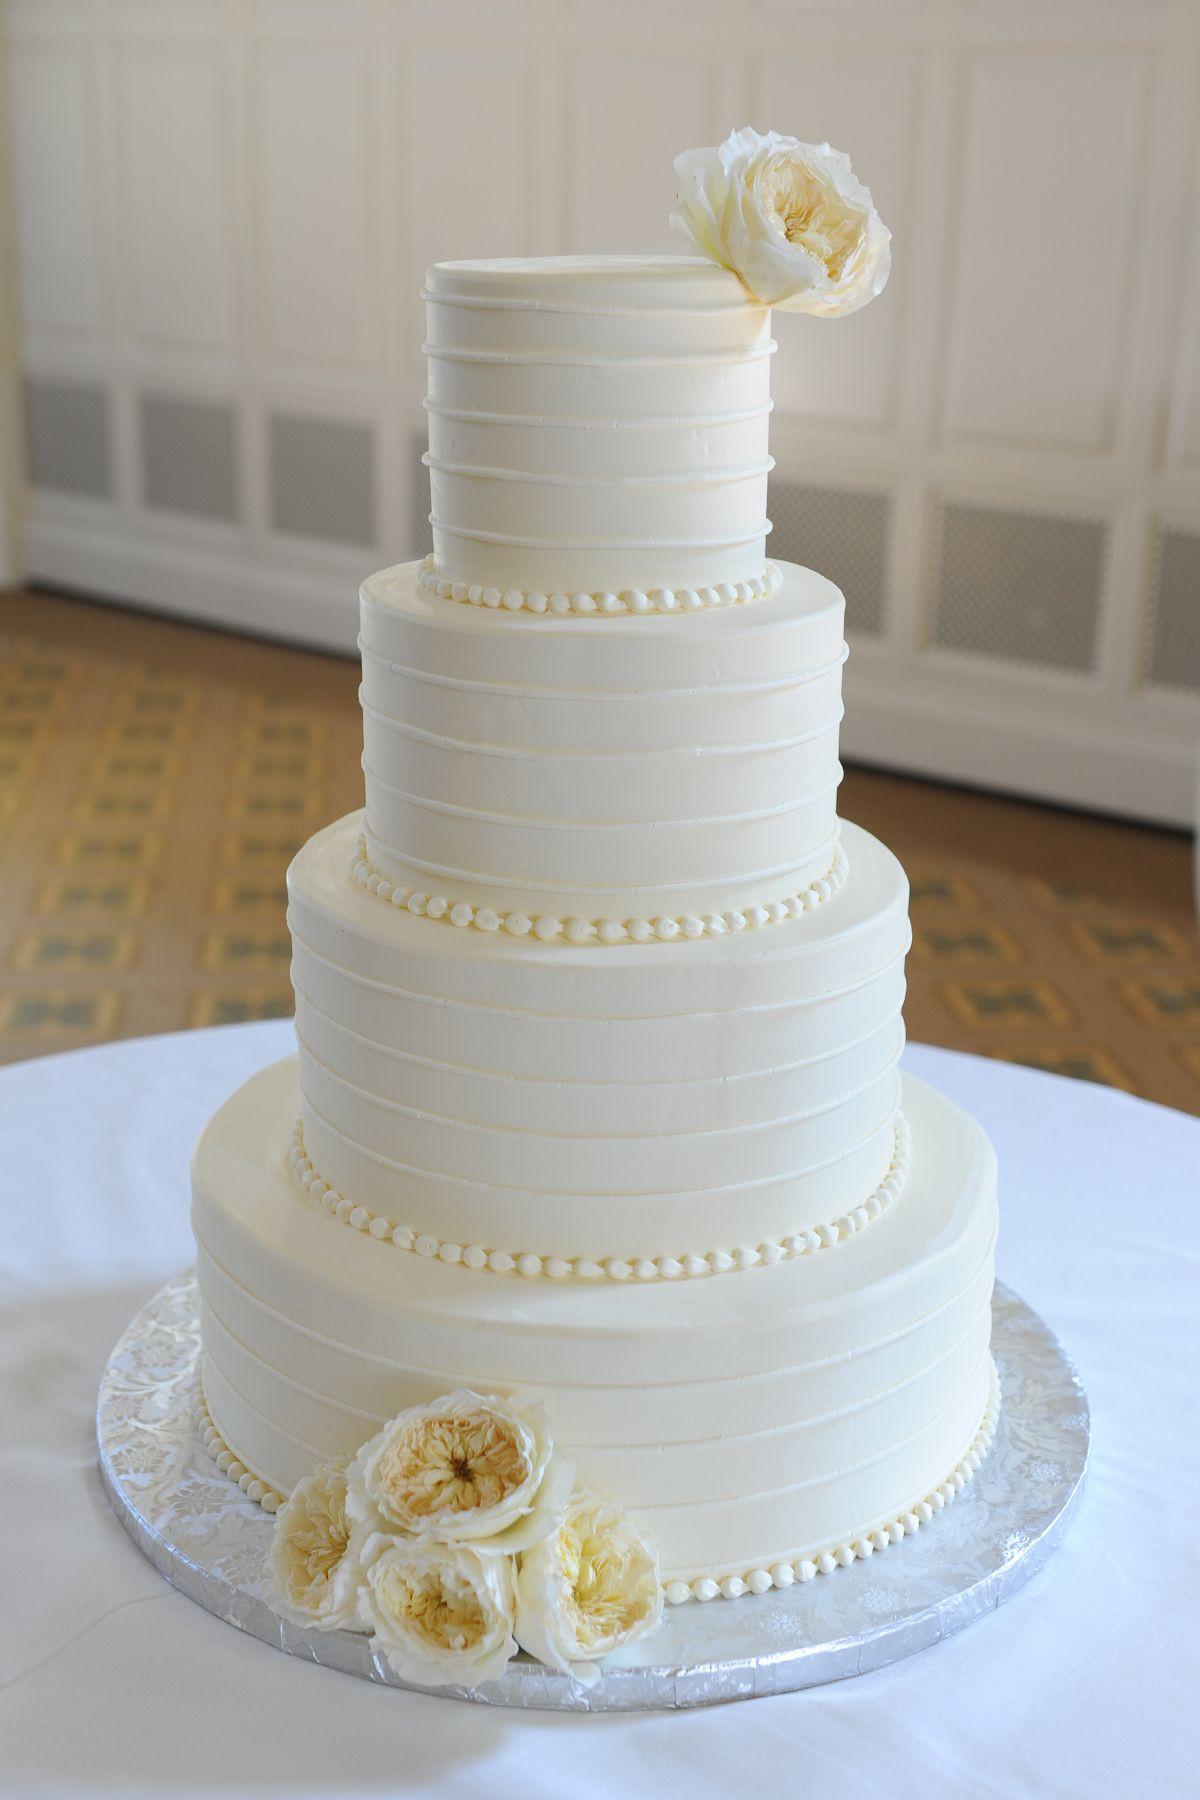 Simple Wedding Cakes Pinterest  Simple White Wedding Cake Tying the knot